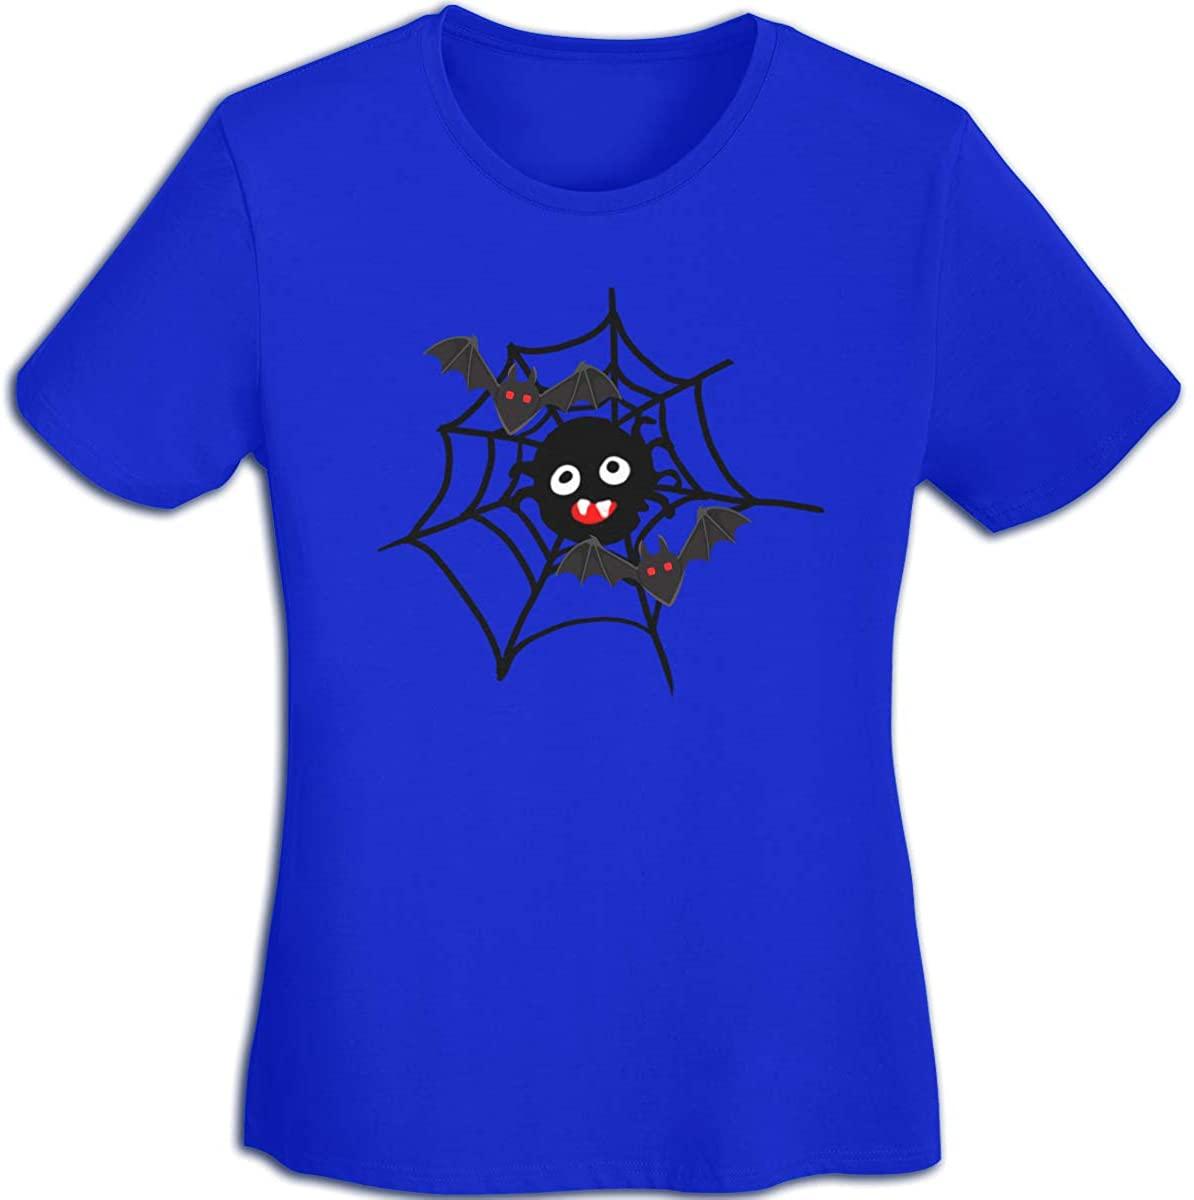 JX-EASY Women's Short Sleeve T-Shirt Crew-Neck Fantastic Tees Baseball Sports Halloween Bats Printing Quick-Dry Shorts